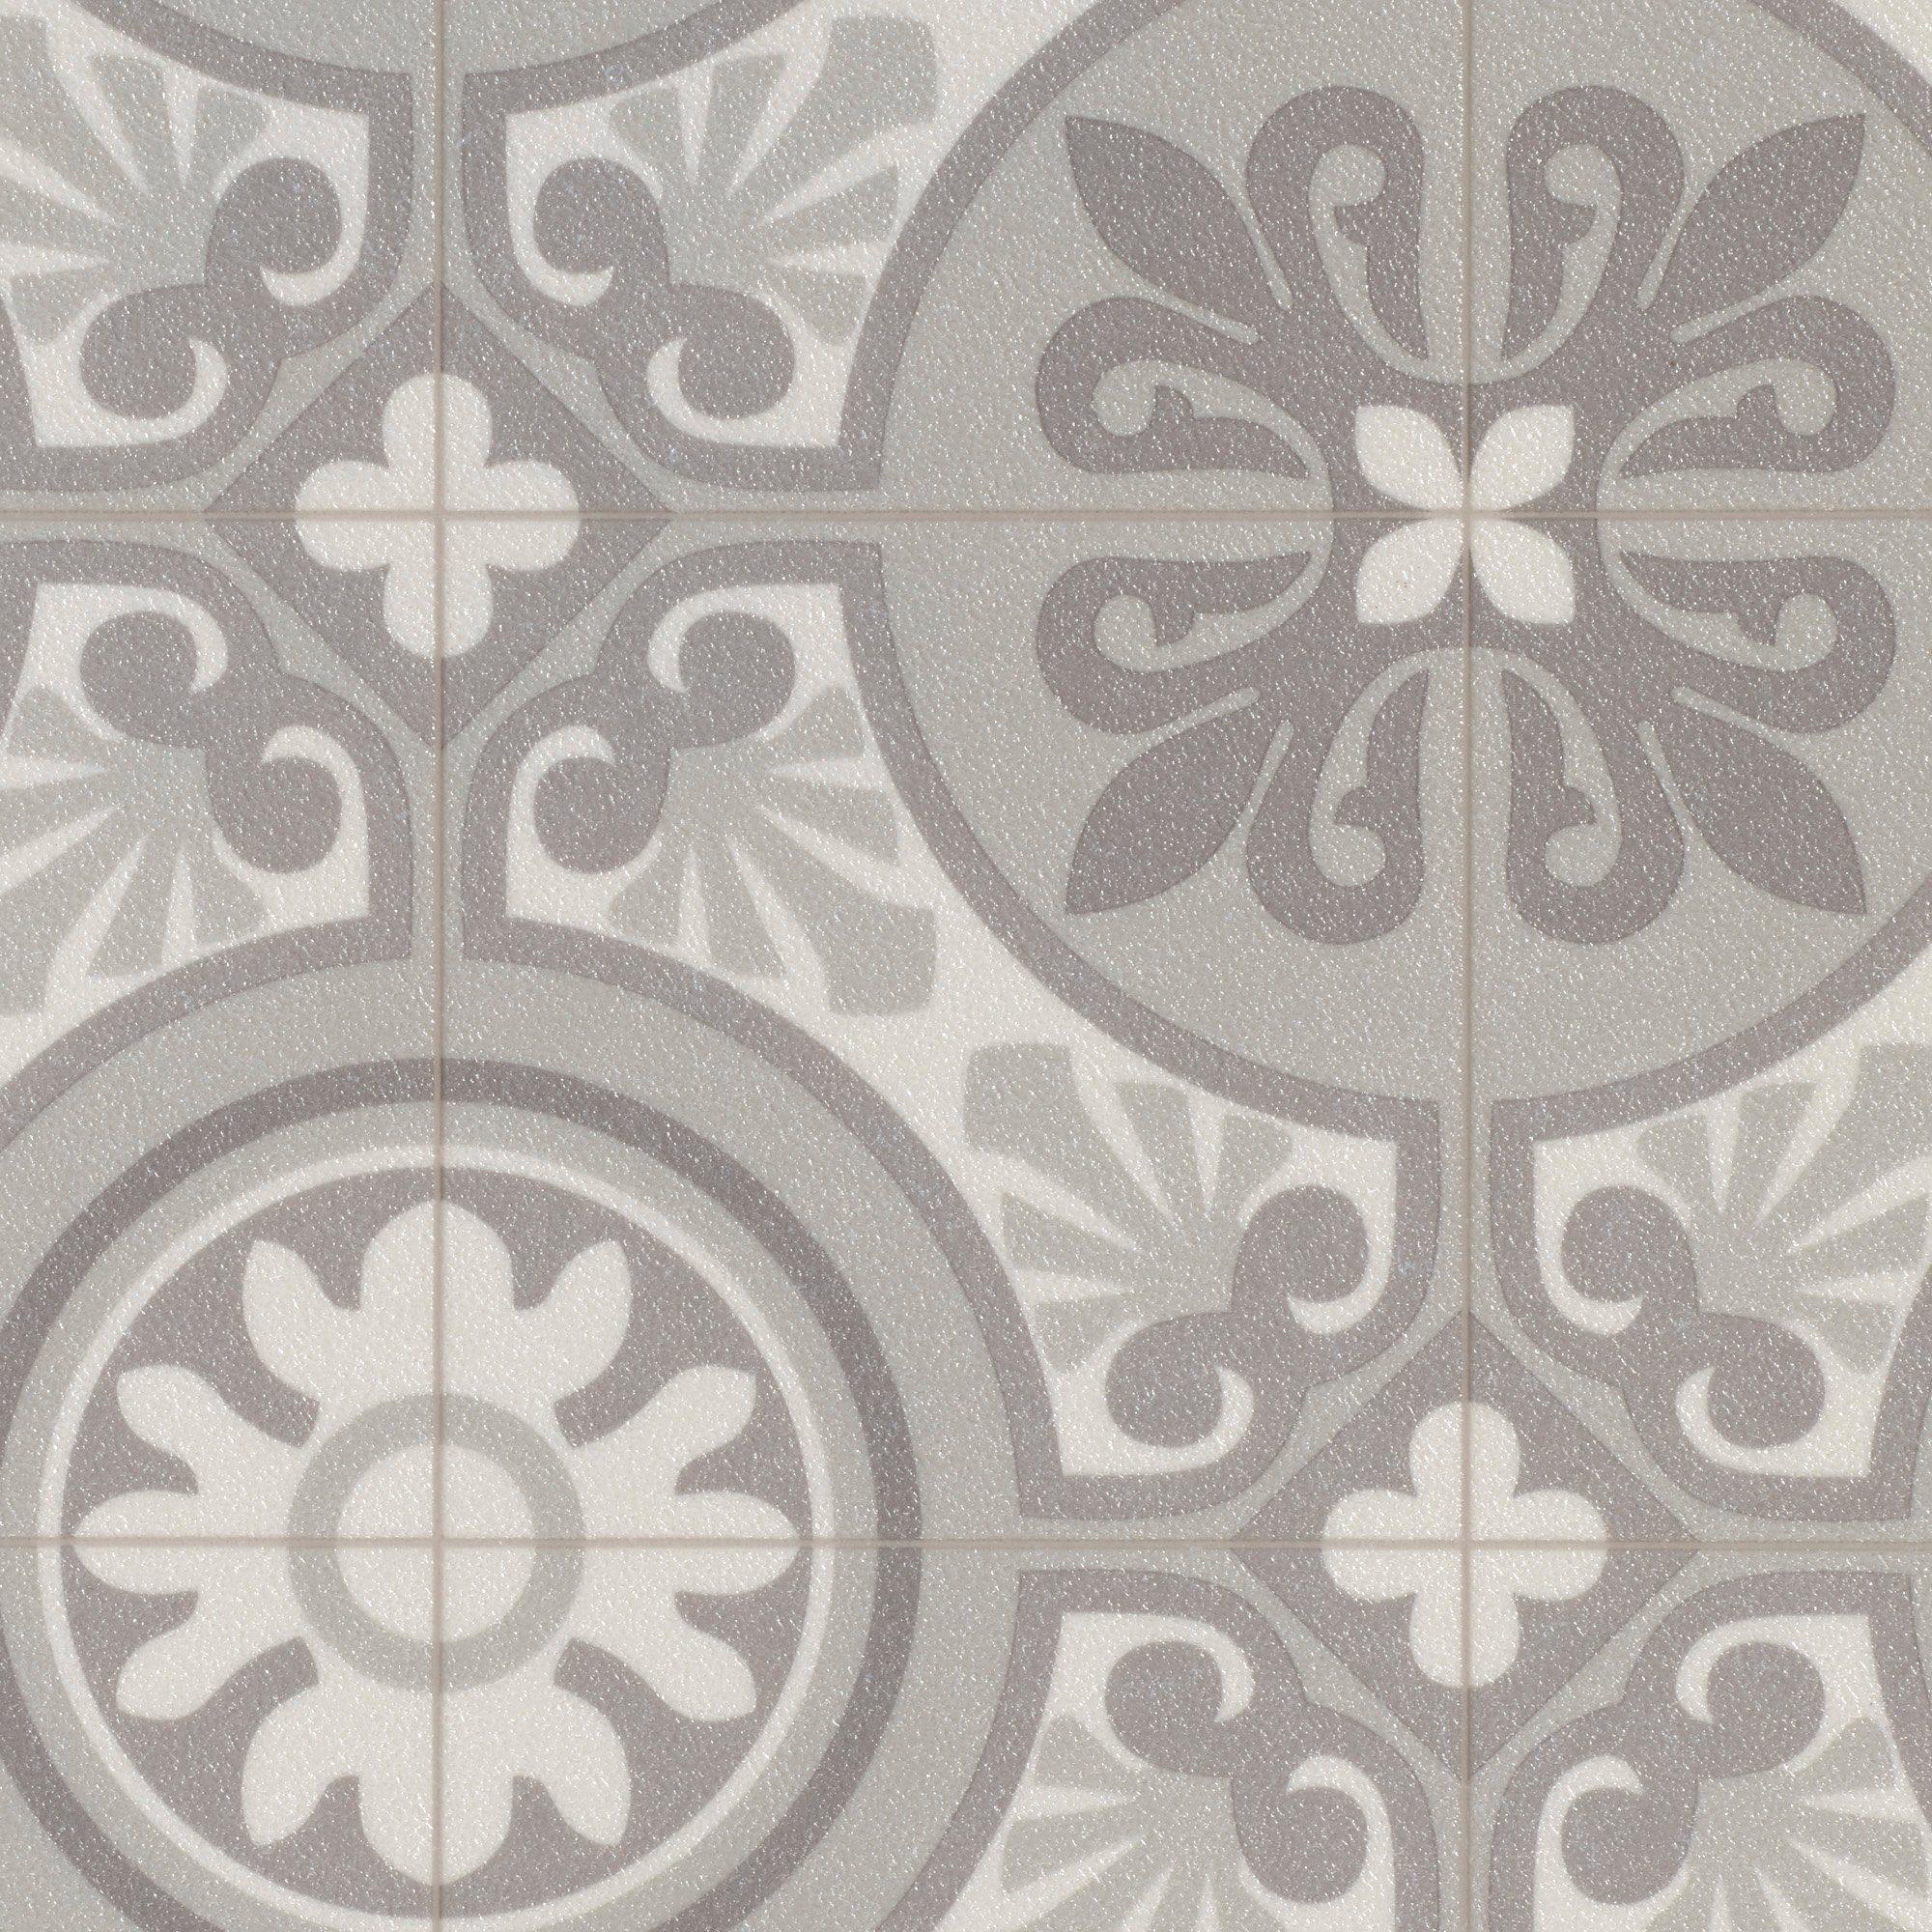 bodenmeister pvc boden vintage trend kaufen otto. Black Bedroom Furniture Sets. Home Design Ideas